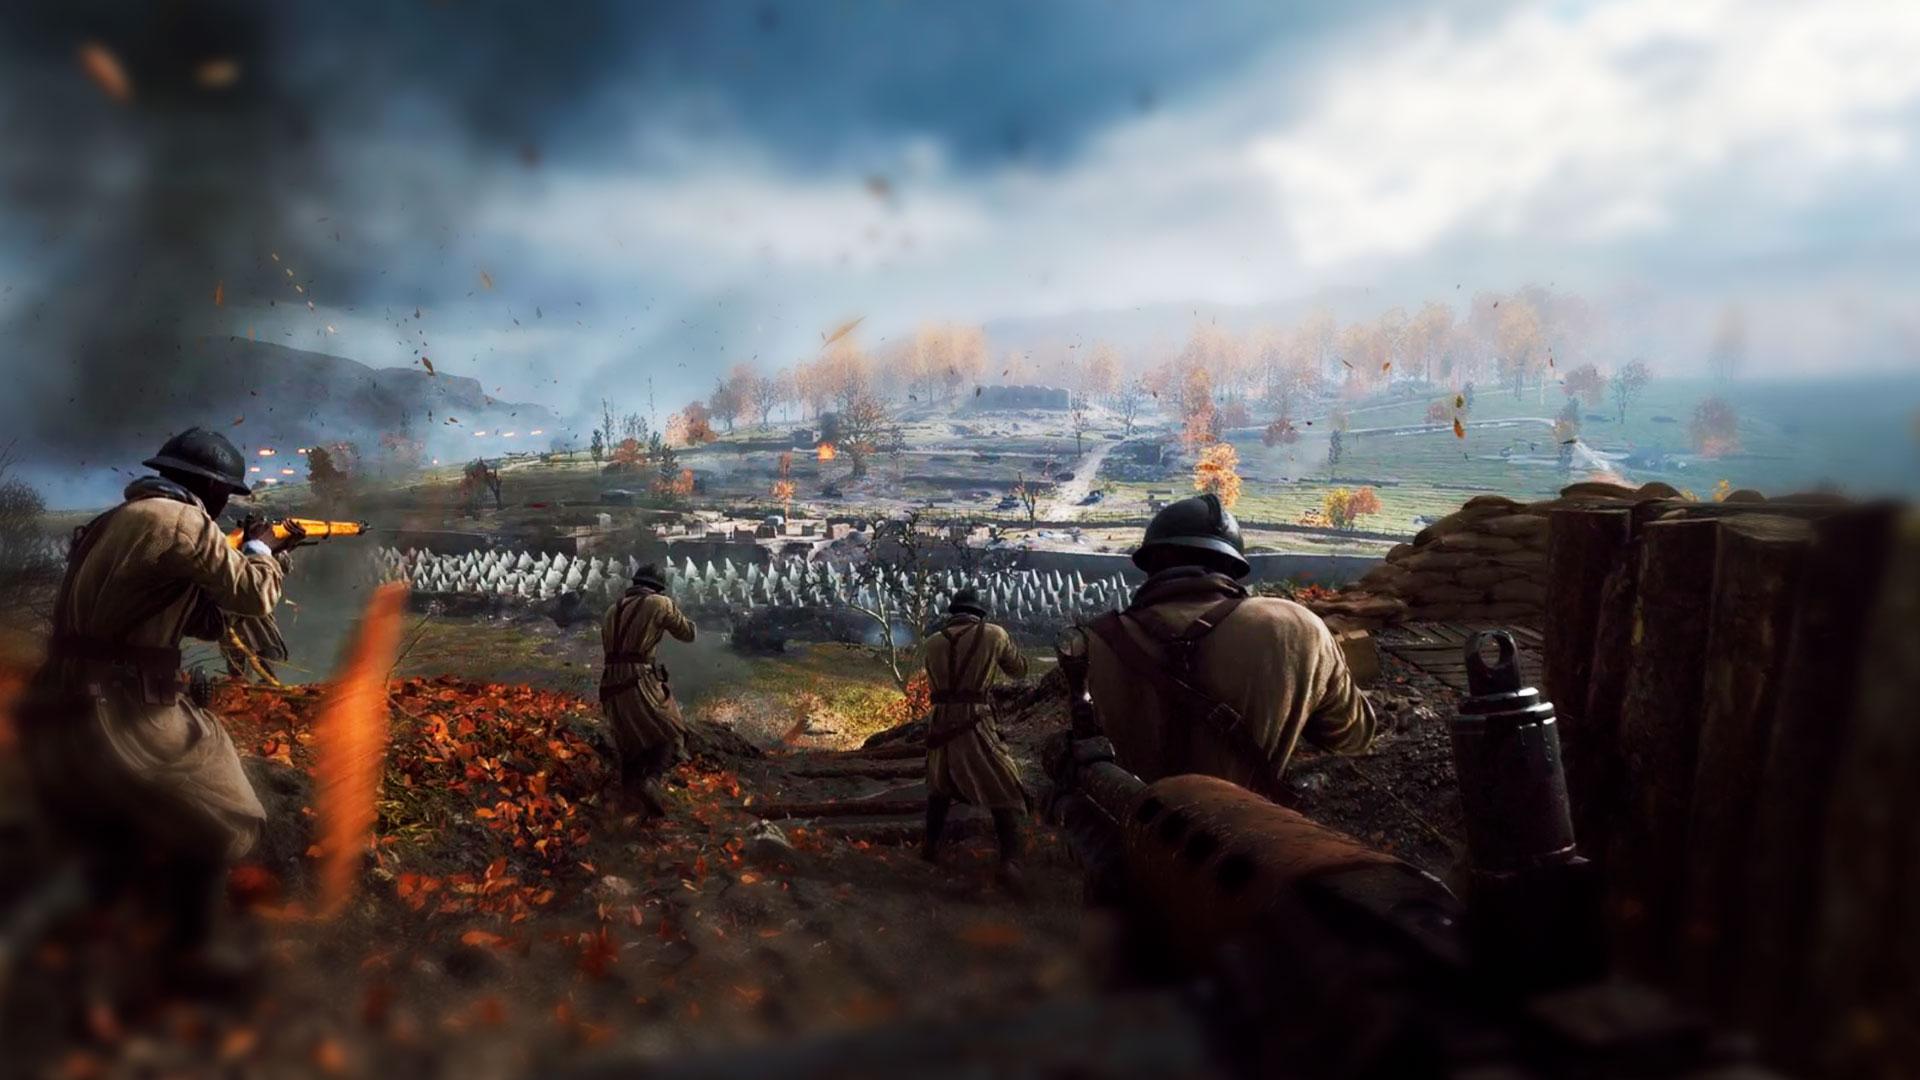 BattleField и военные действия